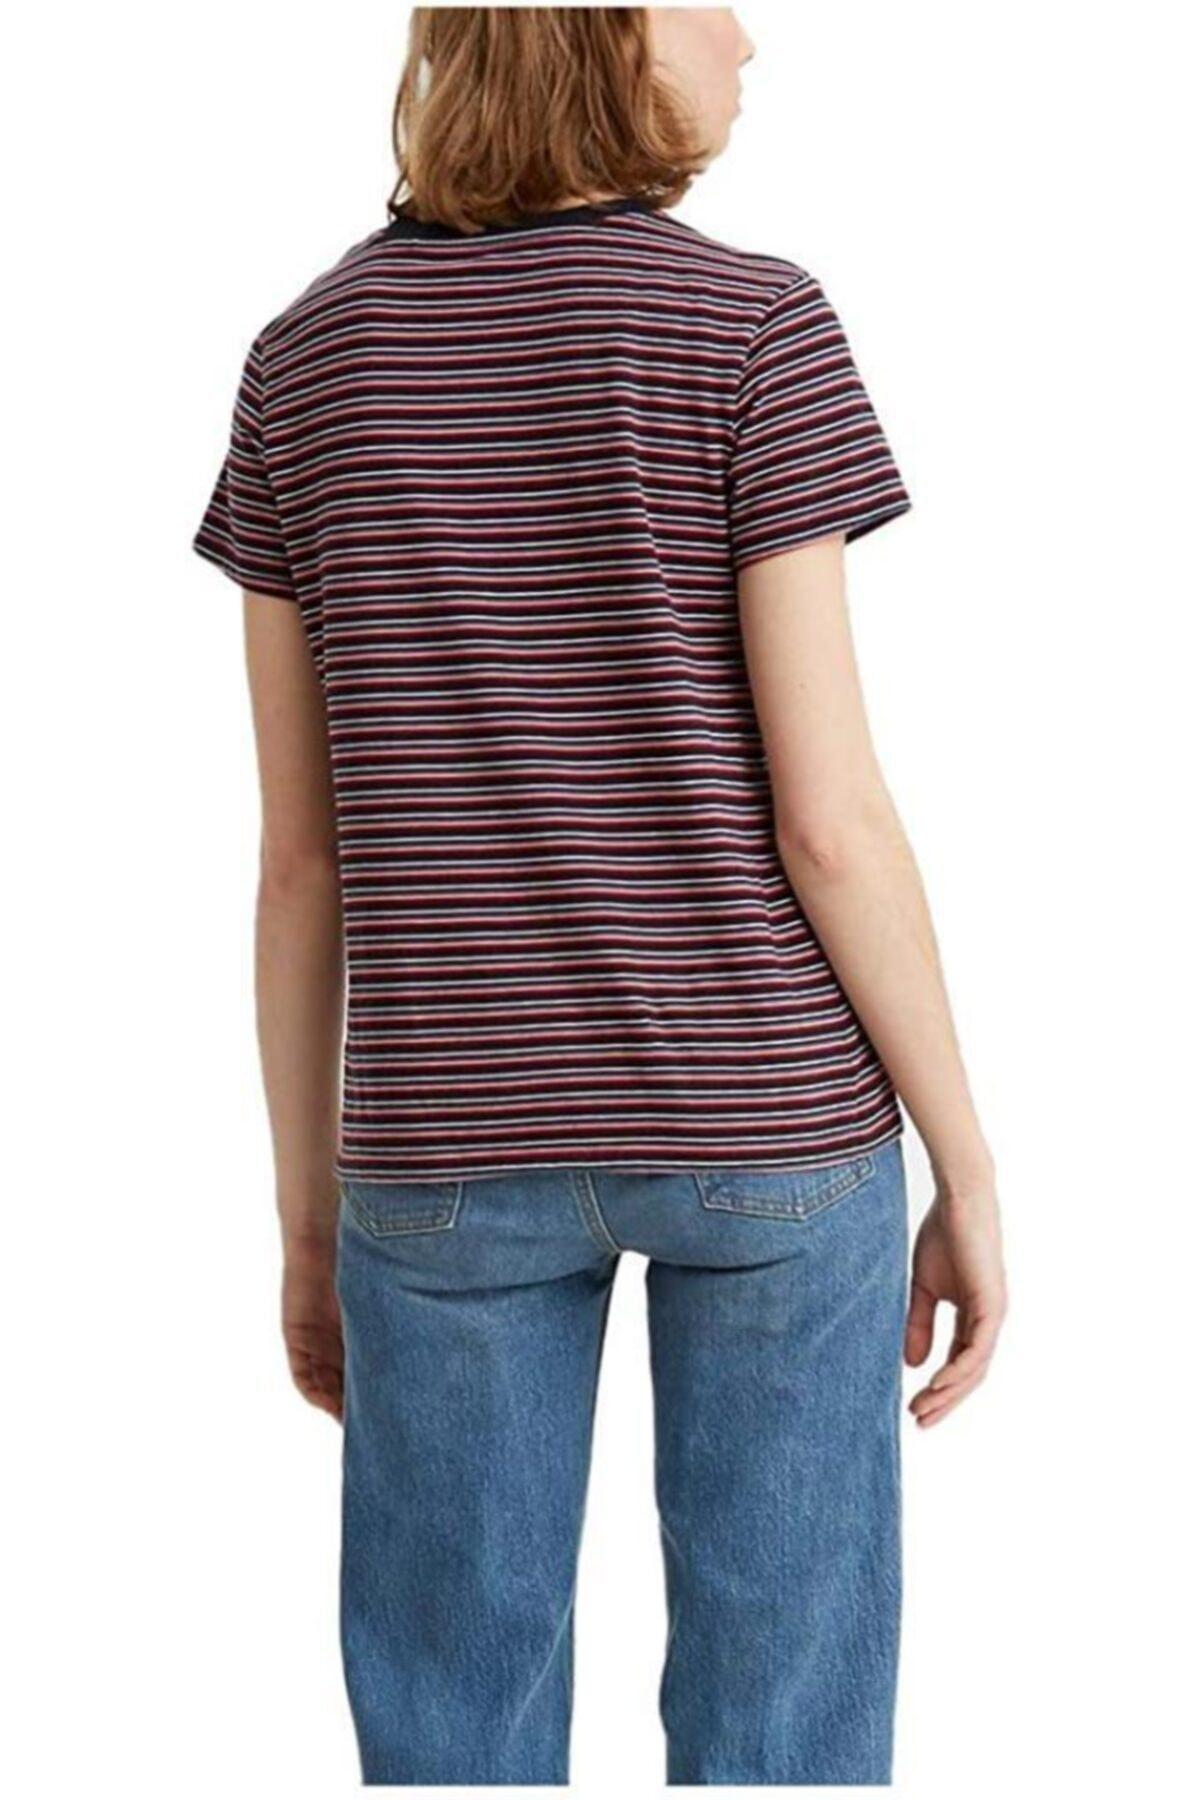 Levi's Kadın T-Shirt 39185-0102 2